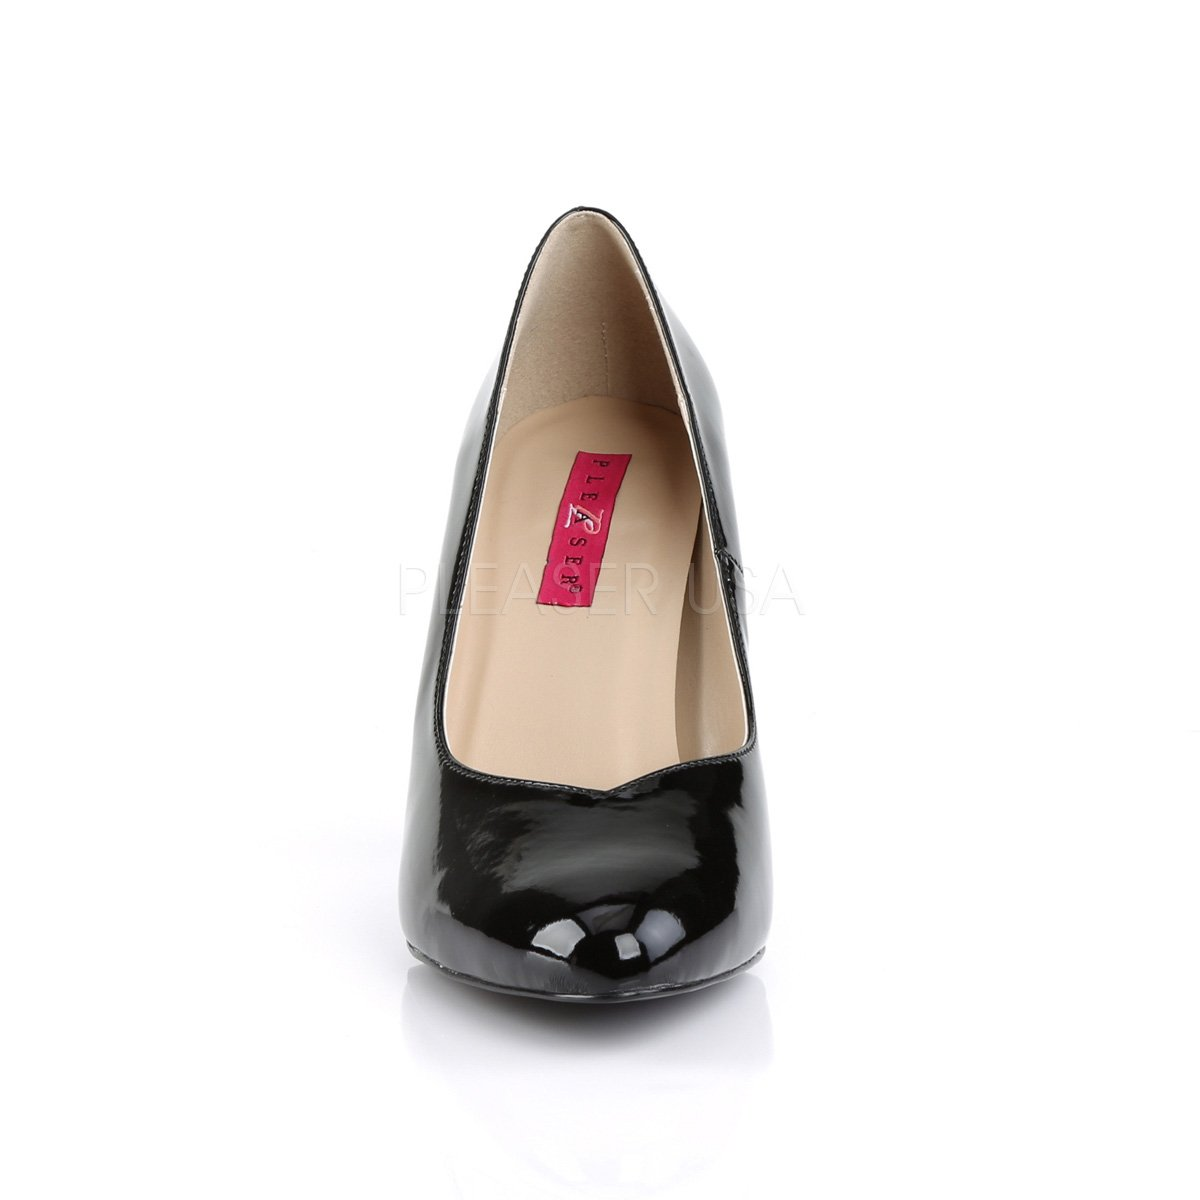 Pink Label Lack OverGröße Pumps Dream-420 Lack Label schwarz Big Größe Übergrößen Lack Schwarz ba2778